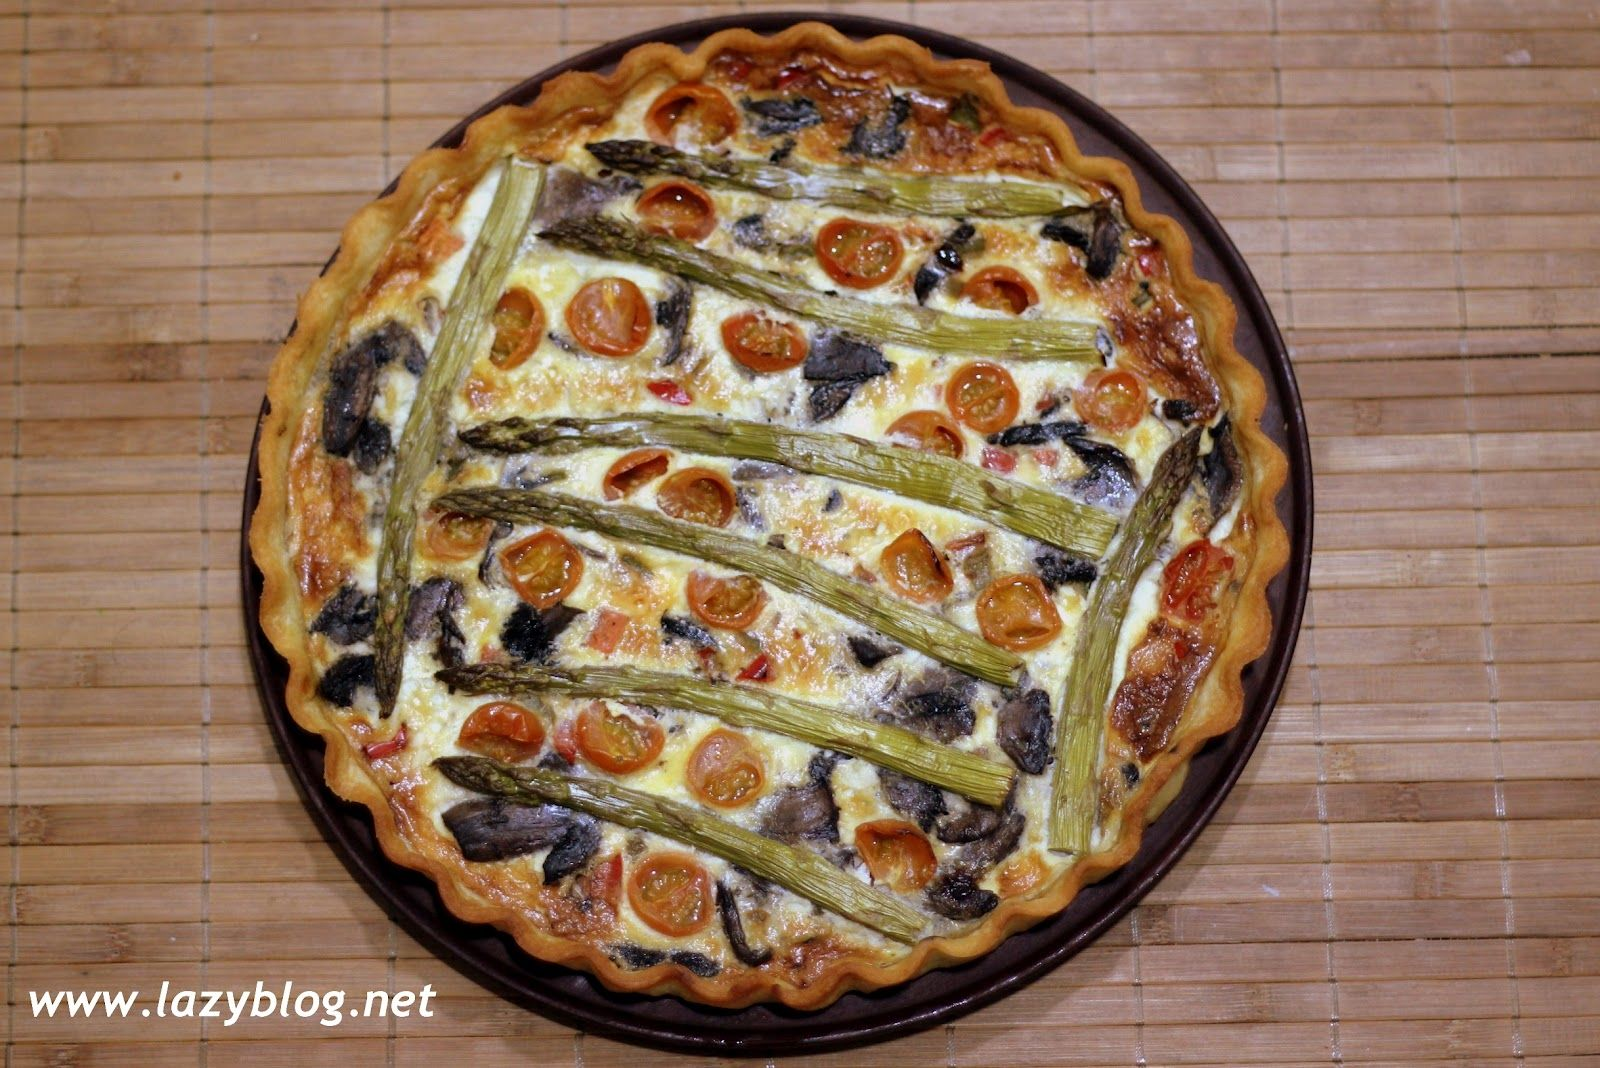 Tarta de verduras al horno / Vegetarian pie